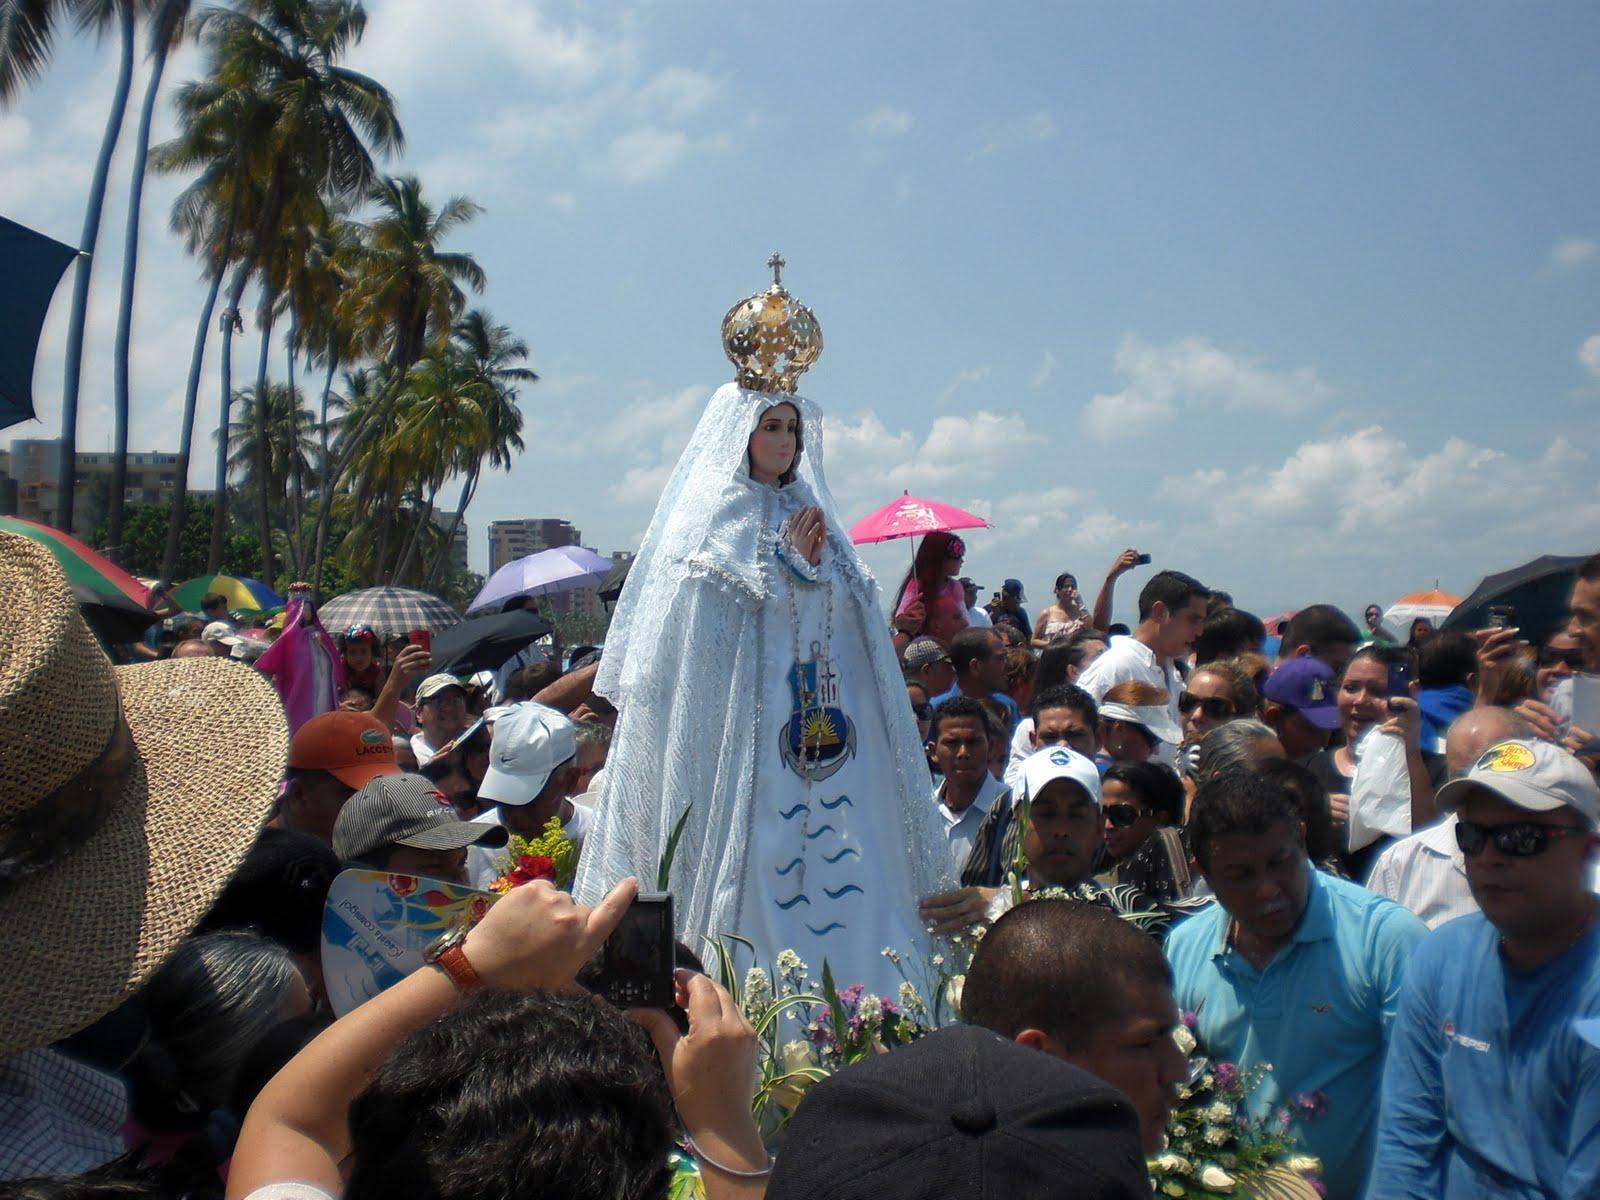 club Virgen paseo